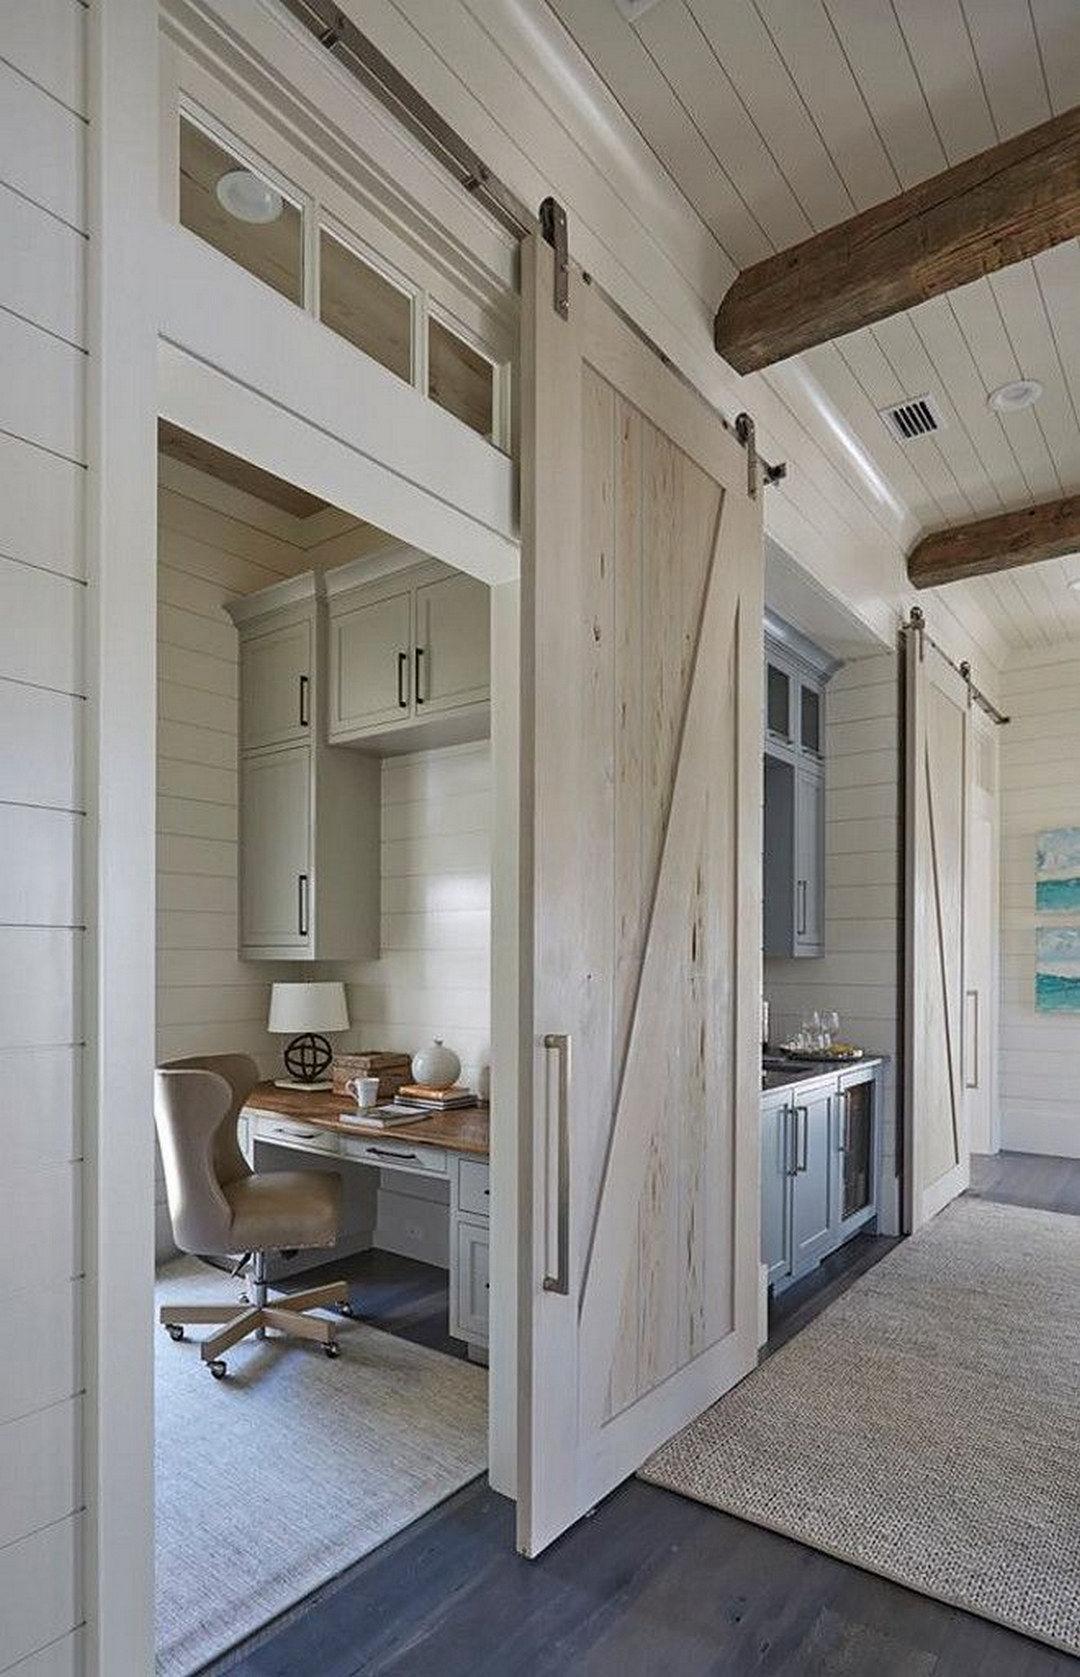 87 Barn Style Interior Design Ideas | I N T E R I O R | Home Decor Barn Doors Interior House Designs Html on wood interior house design, white interior house design, barn doors interior design ideas,